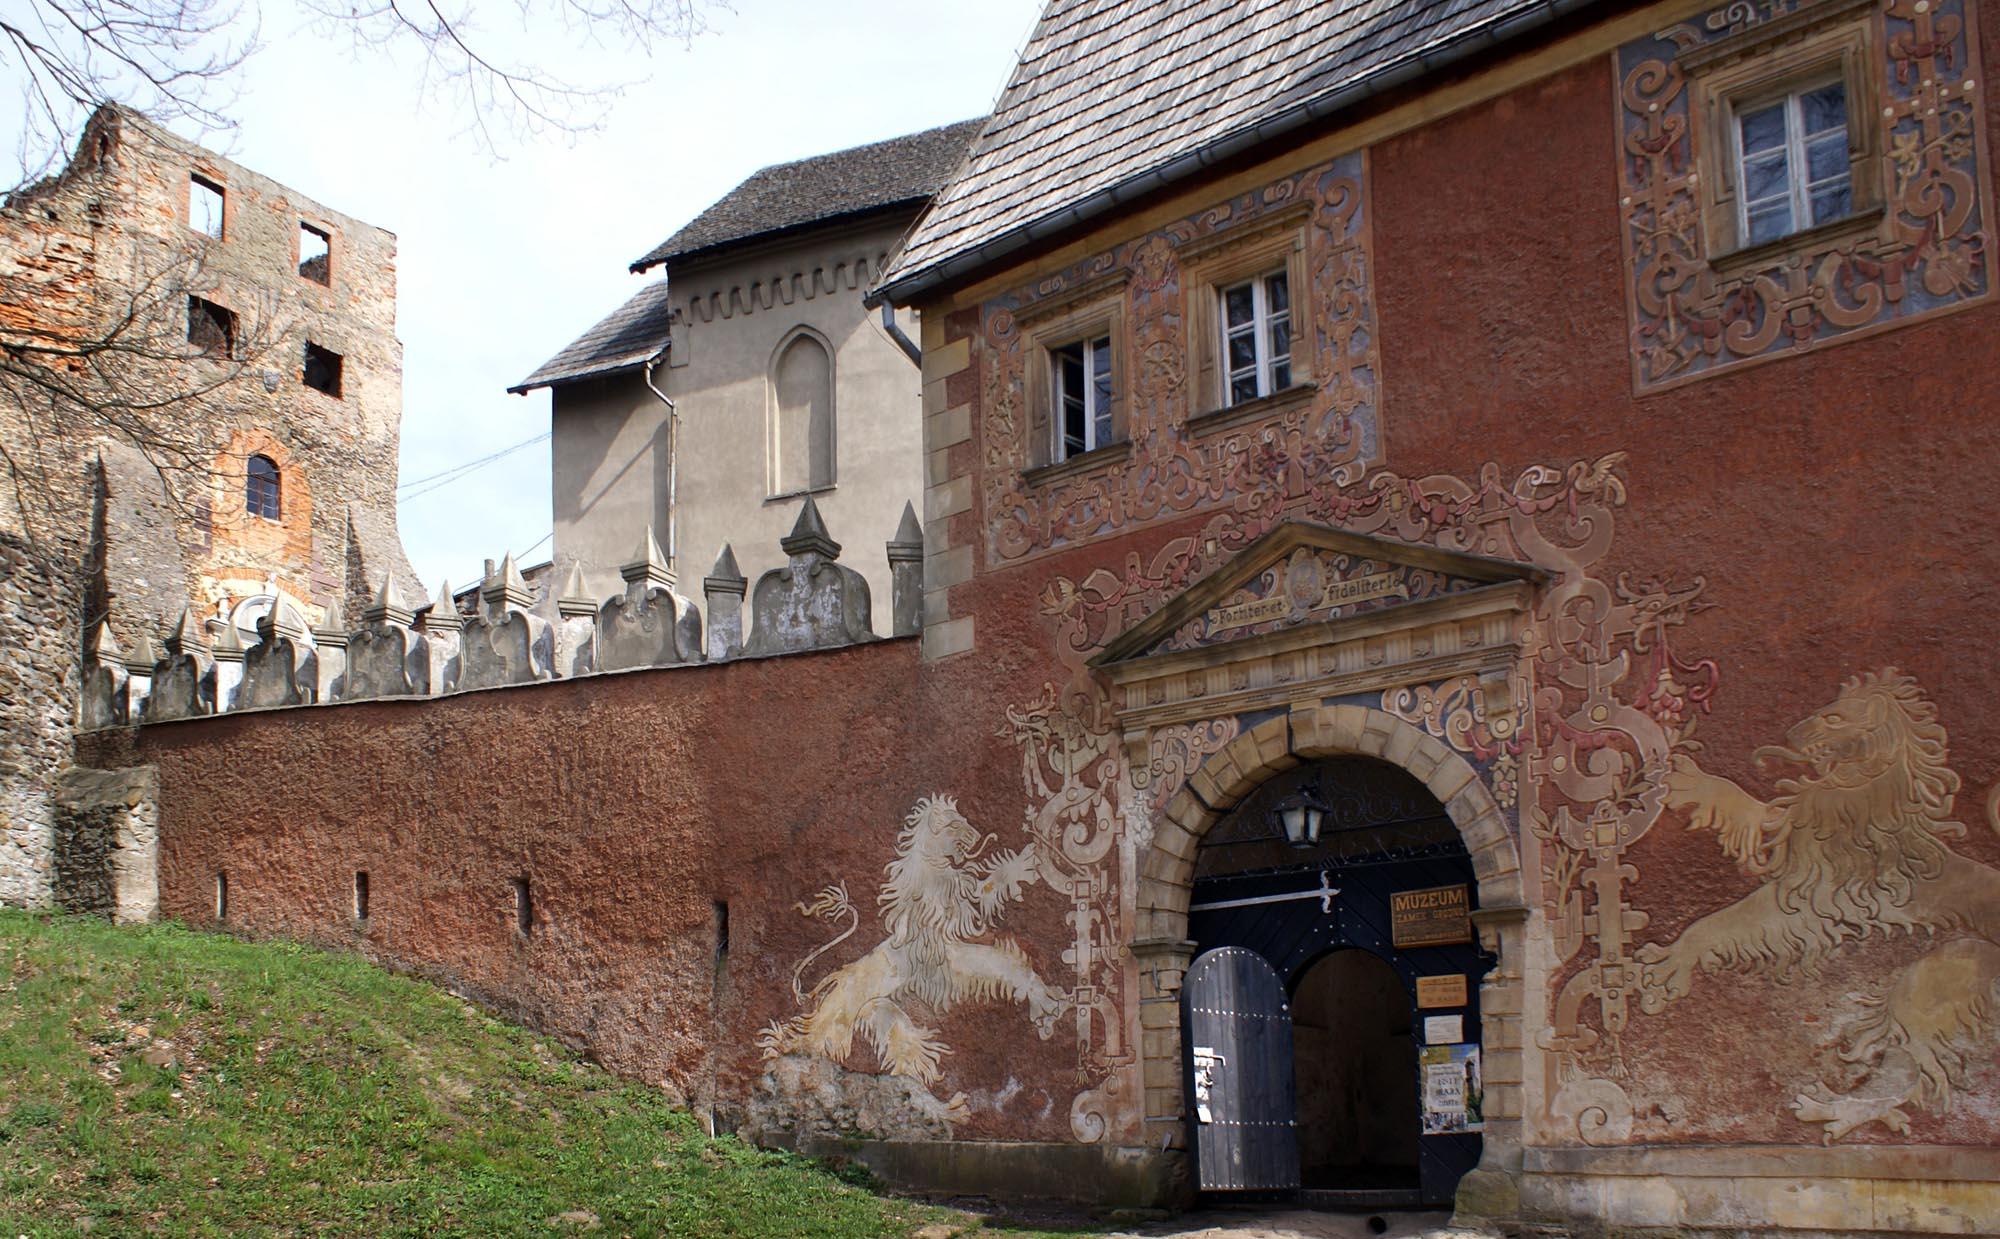 Foto: Barbara Maliszewska (Eigenes Werk) [CC BY-SA 3.0 pl (http://creativecommons.org/licenses/by-sa/3.0/pl/deed.en)], via Wikimedia Commons